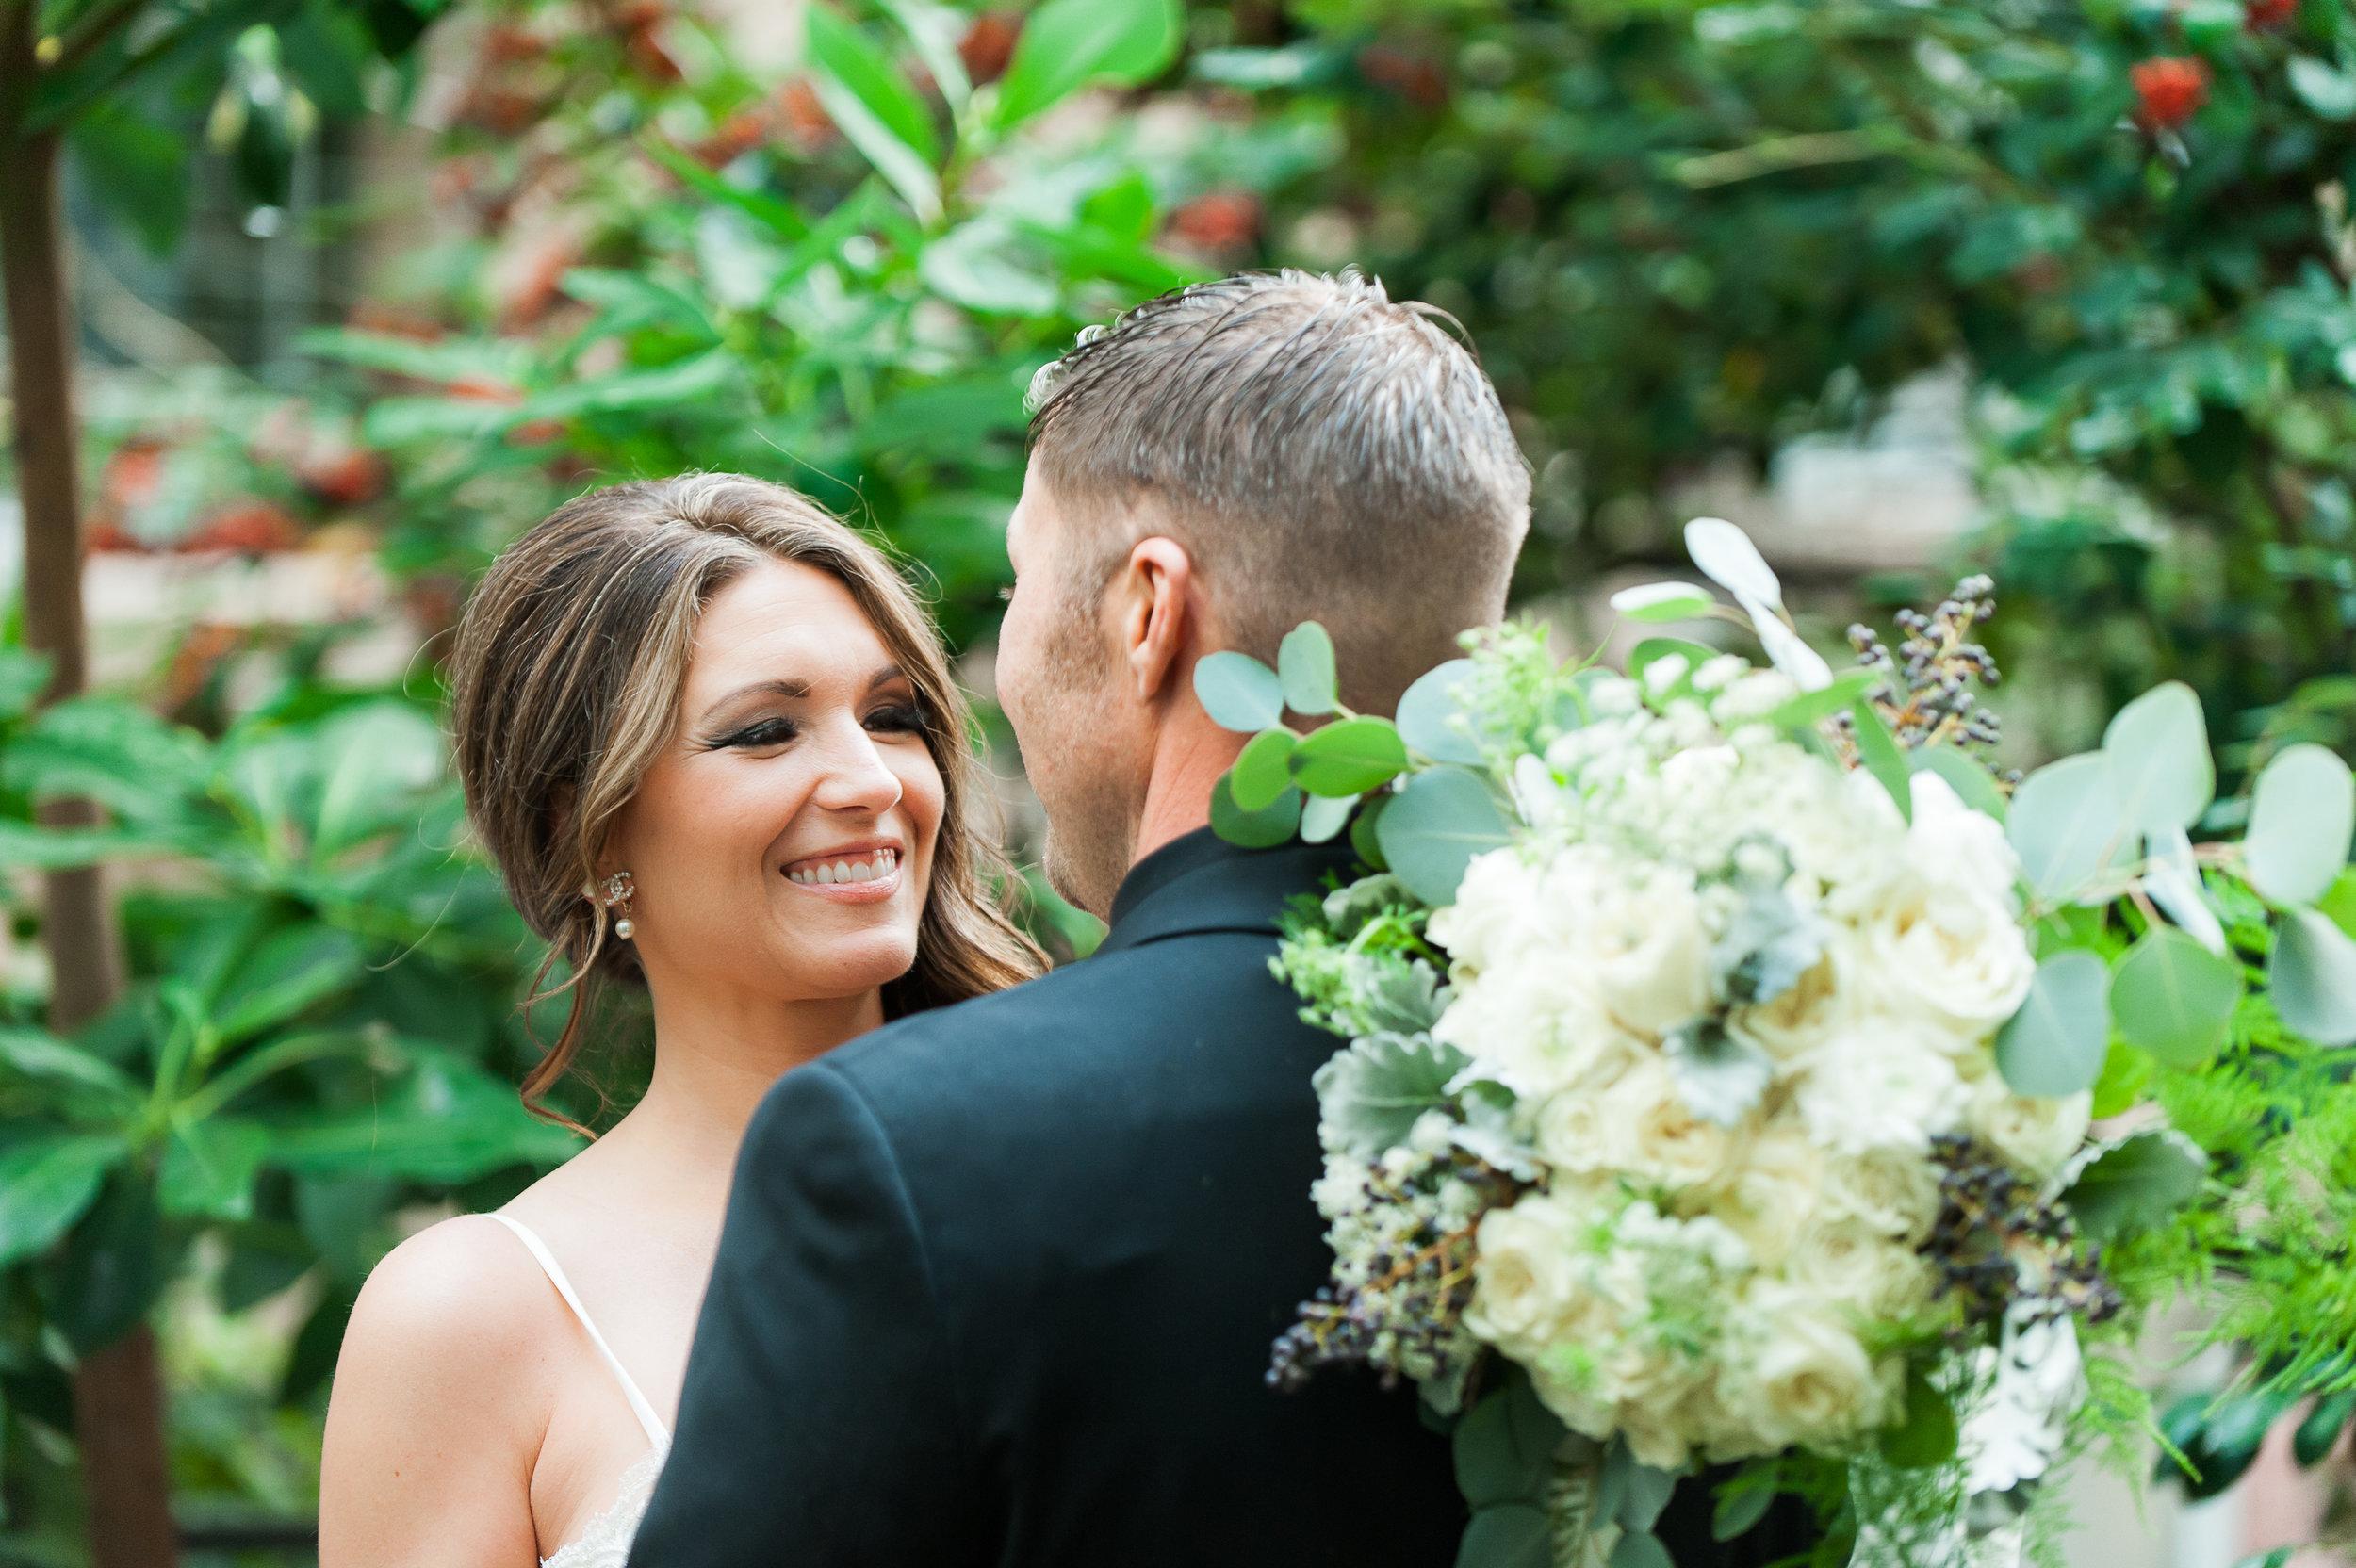 JJ-wedding-Van-Wyhe-Photography-179.jpg